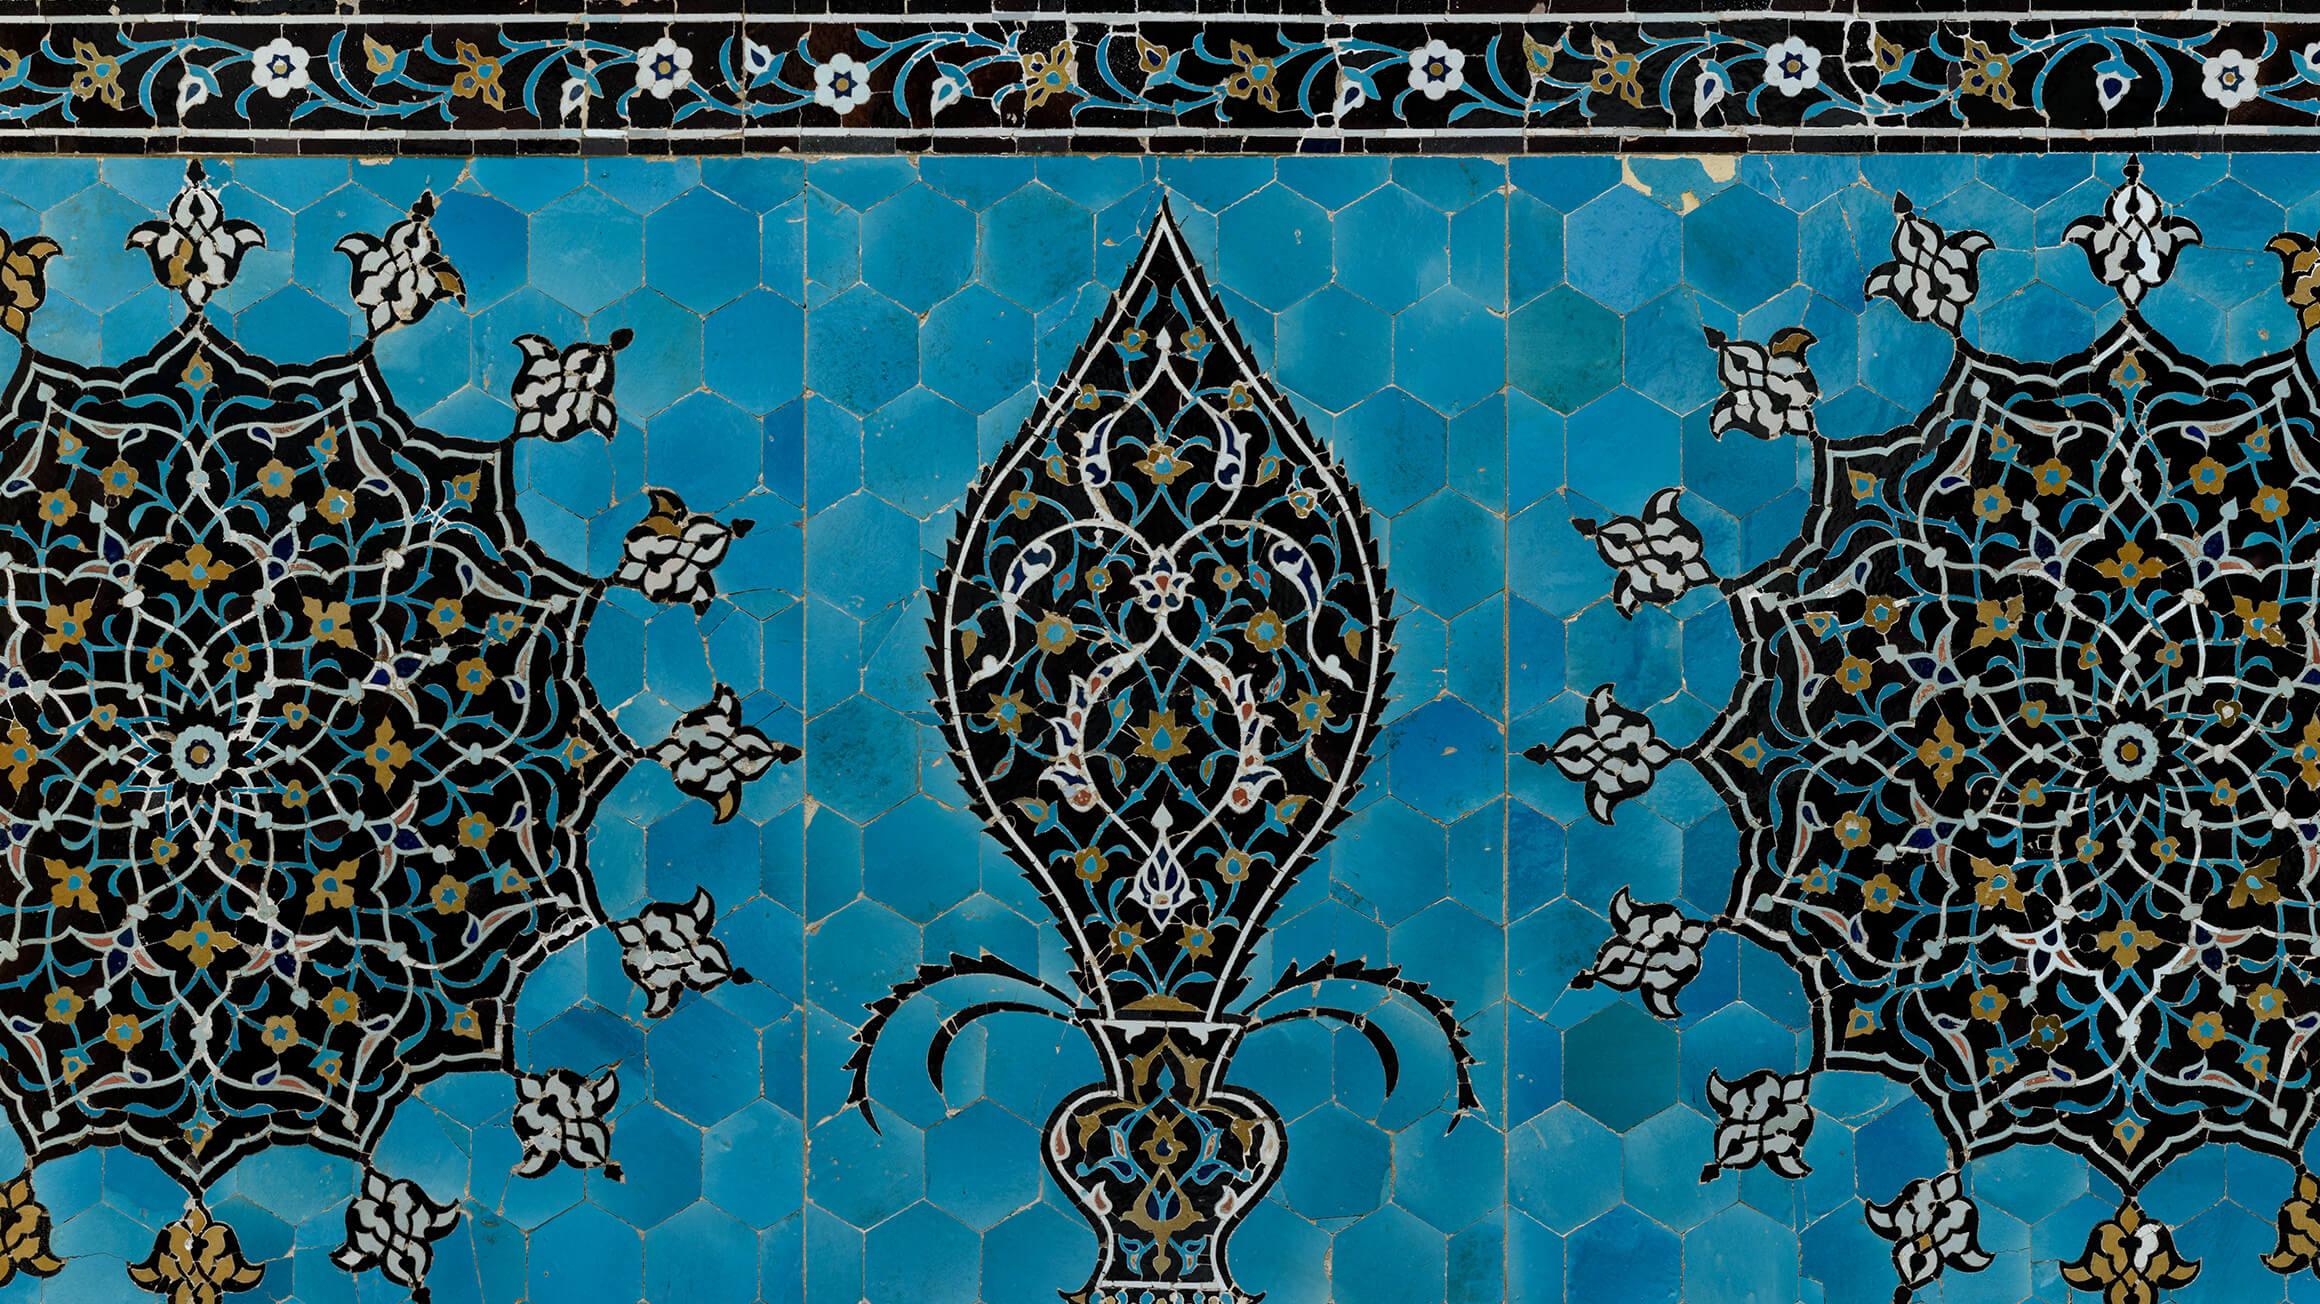 Tile Mosaic Panel, 16th century, made in Iran, 1931-76-1